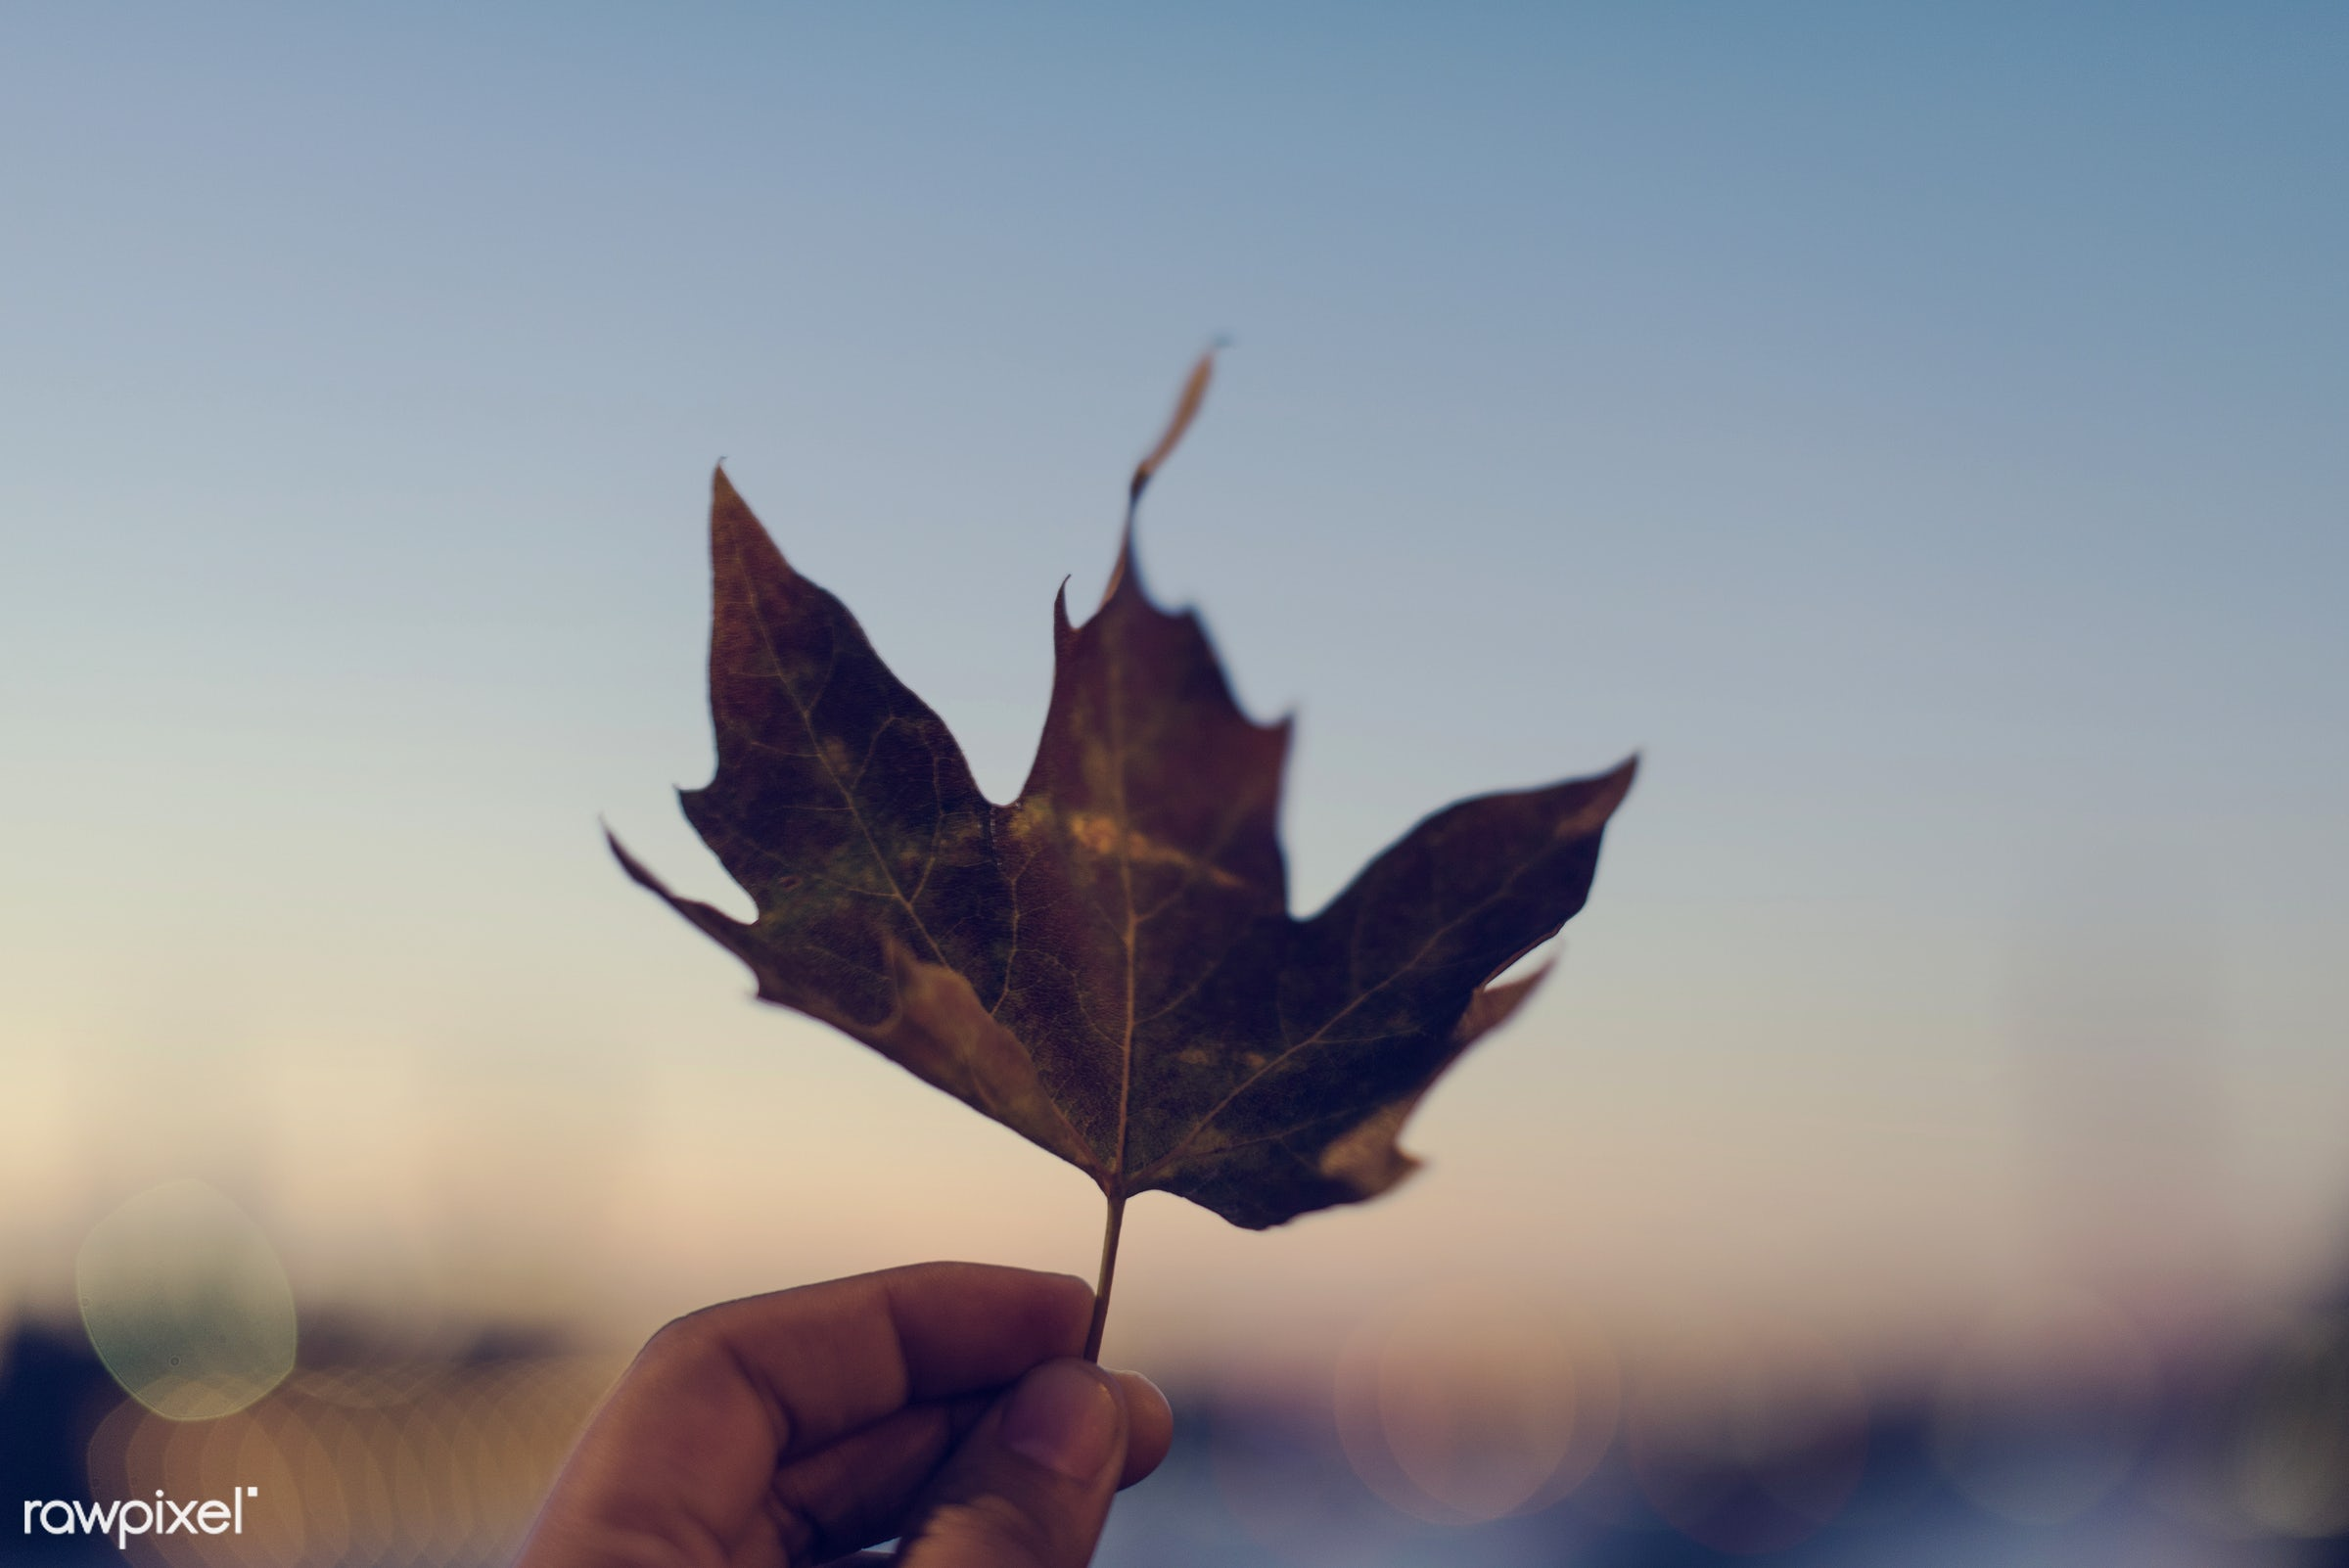 autumn, autumn leaves, beautiful, botanical, botany, defoliation, dry, fade, fall, falling, falling leaves, foliage, forest...